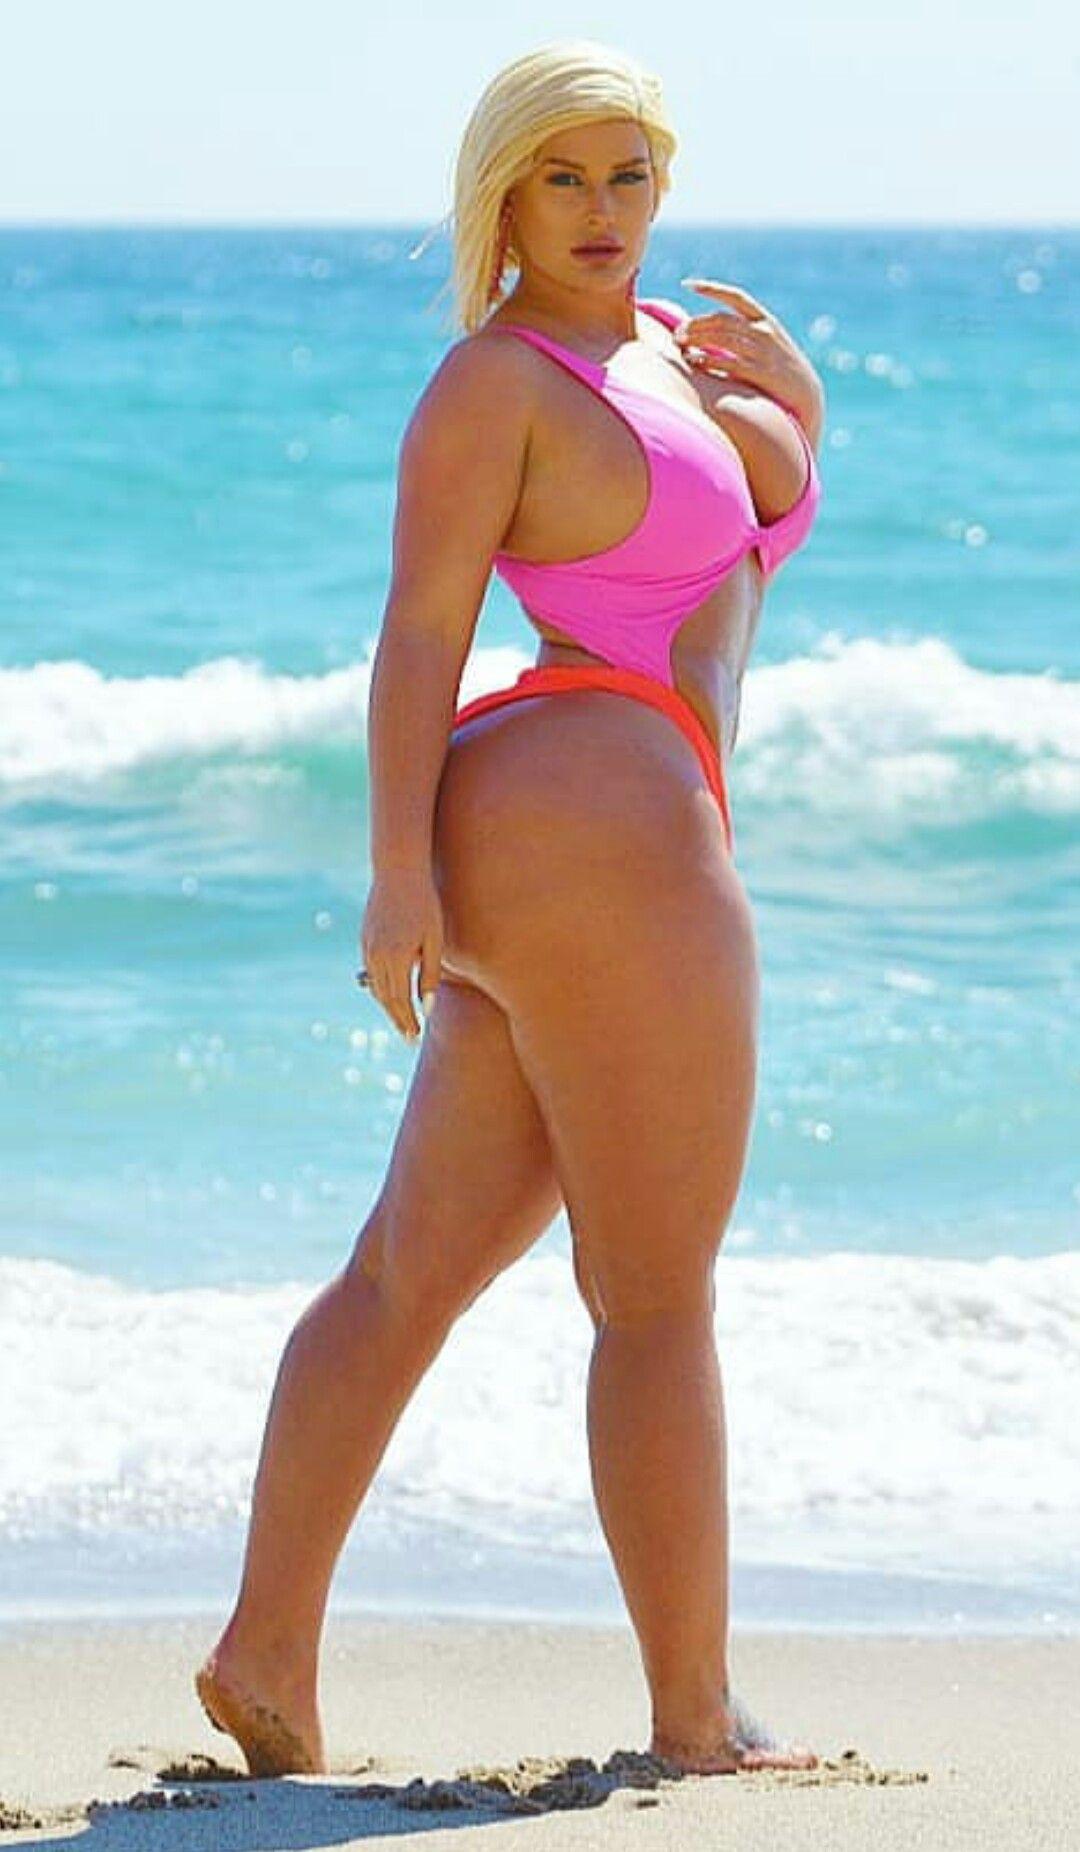 CashCurves Julie CashCurves Curvy BikiniBikinisSexy Legs Julie Curvy mN0w8Ovn